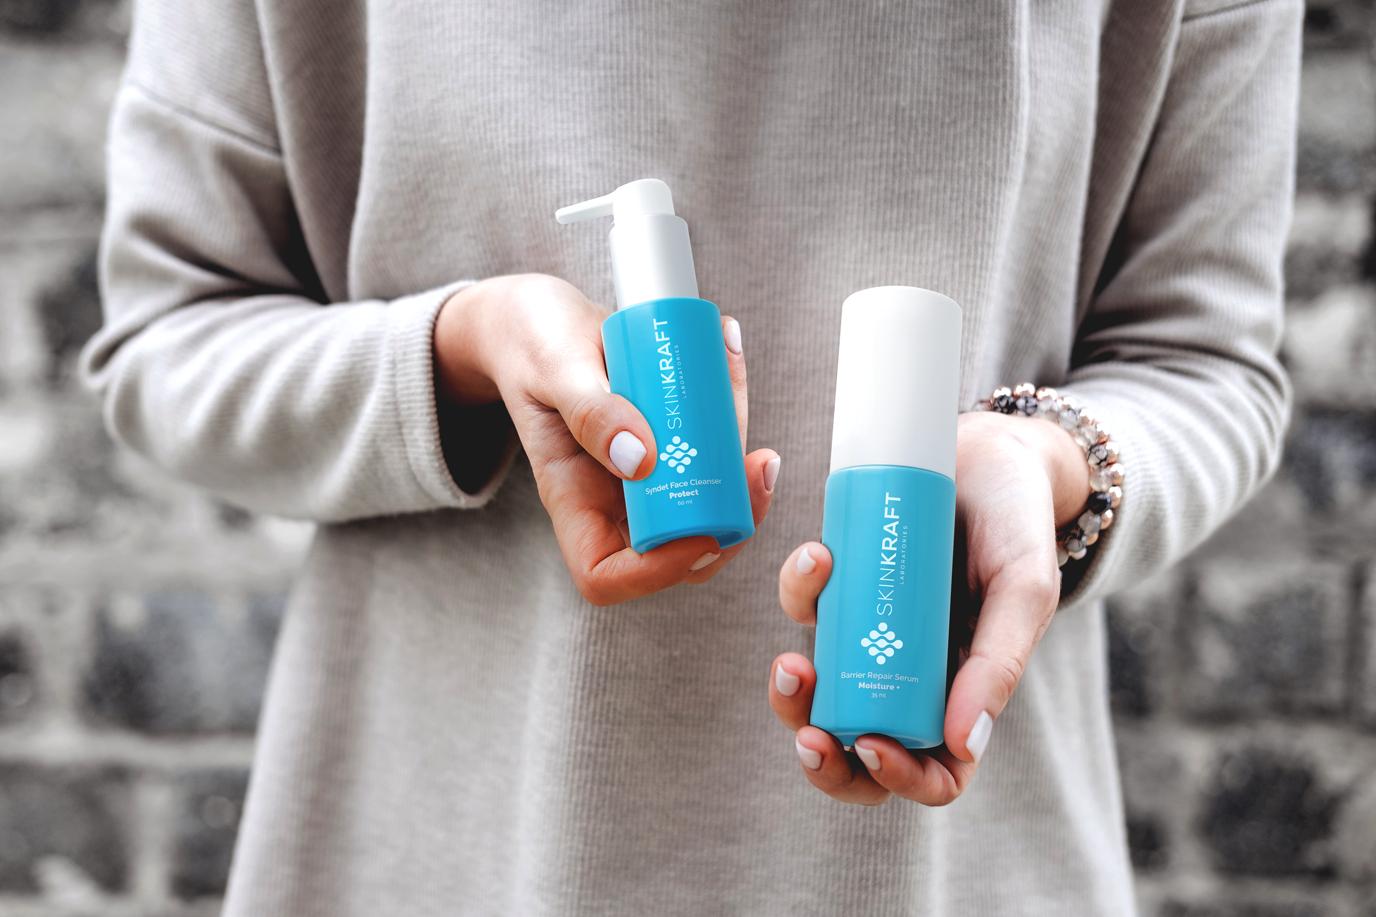 Facewash and moisturiser from Skinkfraft